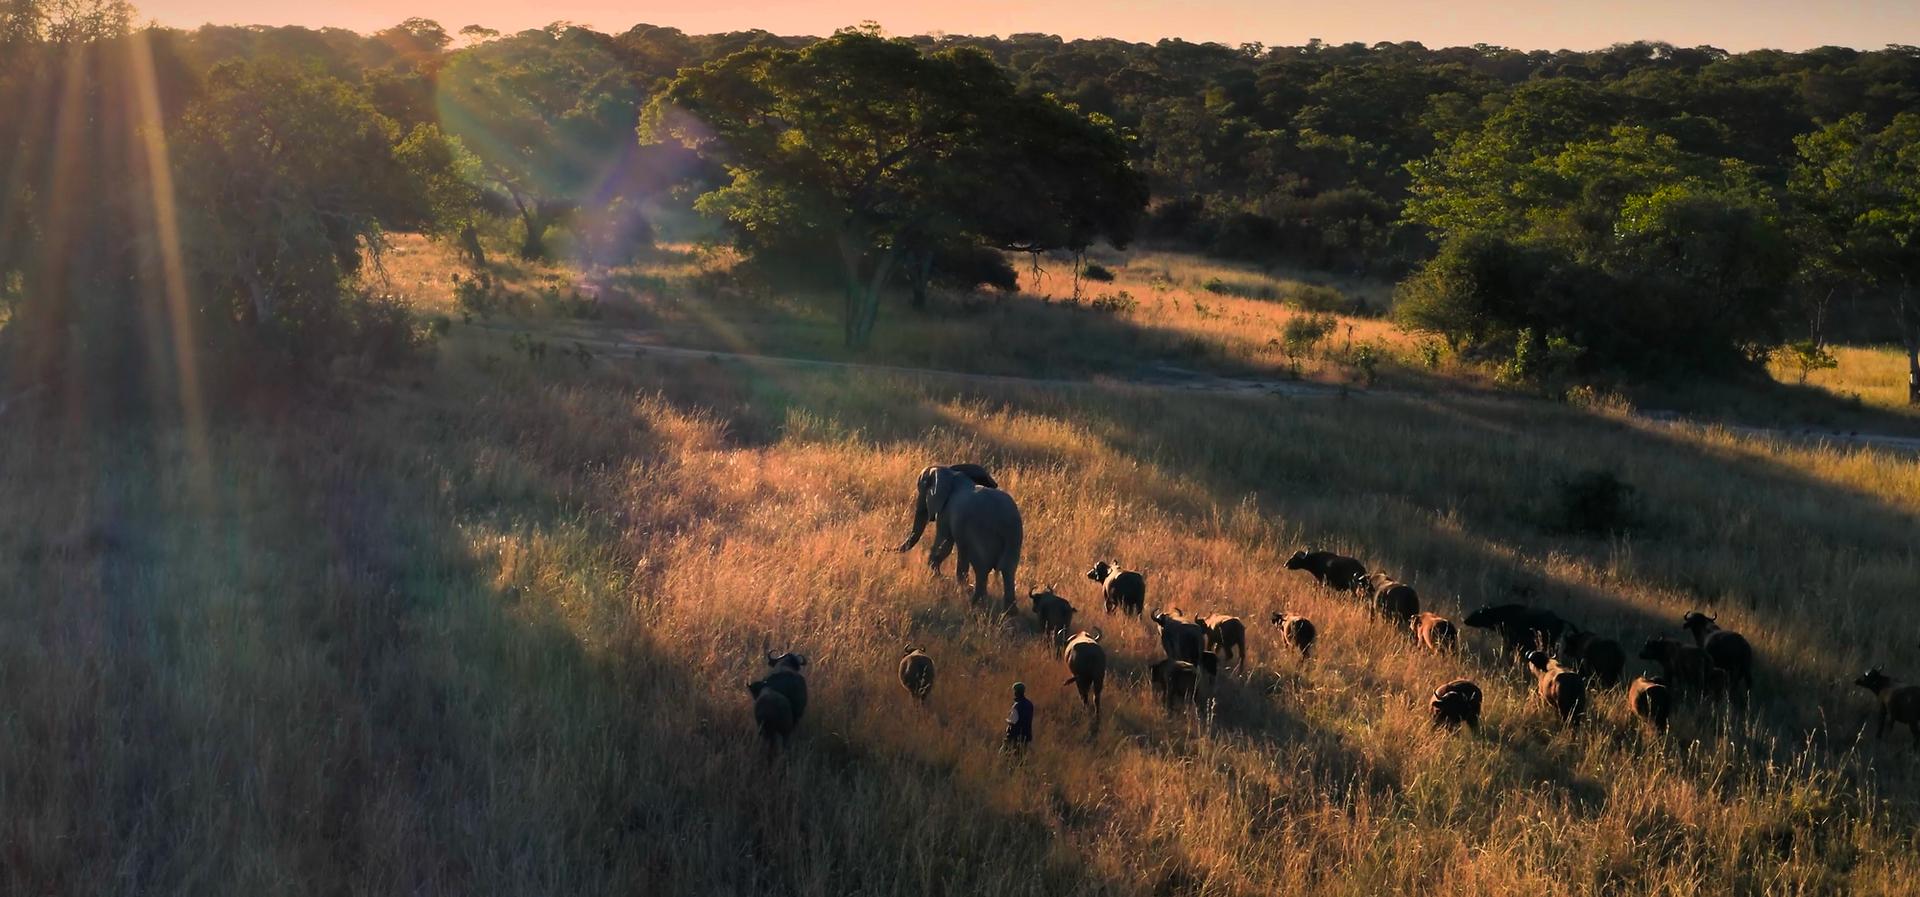 Elephant and Buffalo